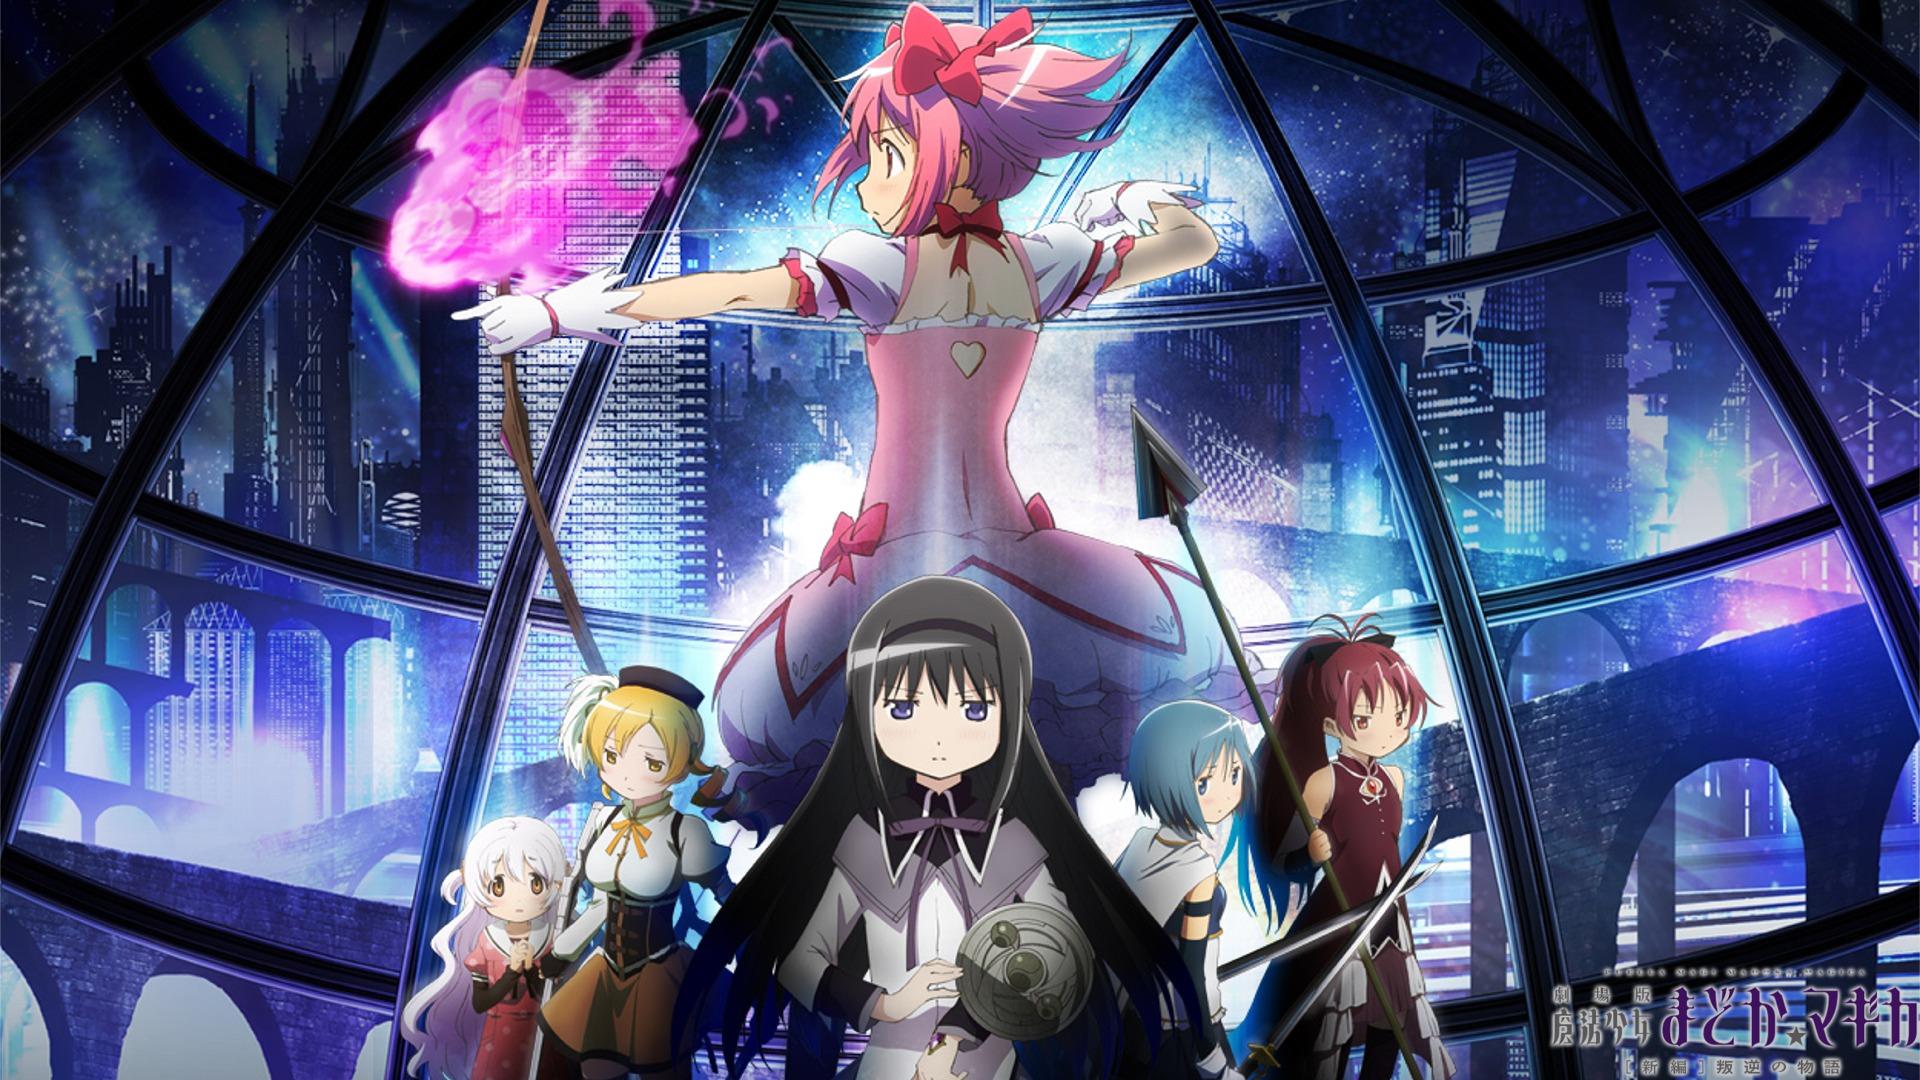 Mahou Shoujo Madoka Magica OST Soundtrack